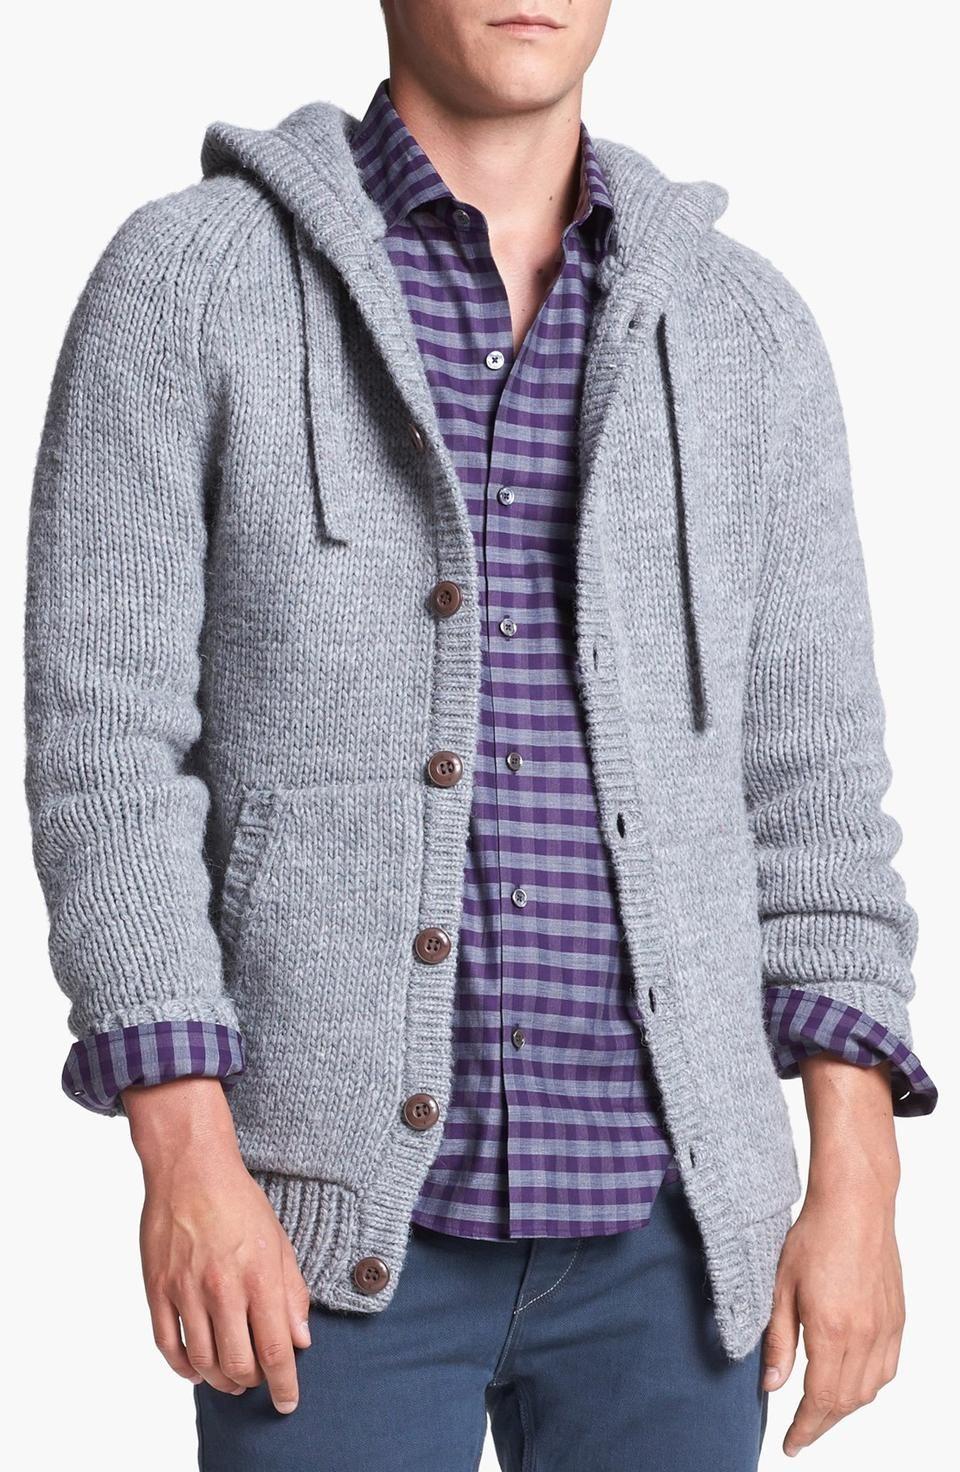 French Connection | 'Delta' Chunky Cardigan #shawl cardigan ...